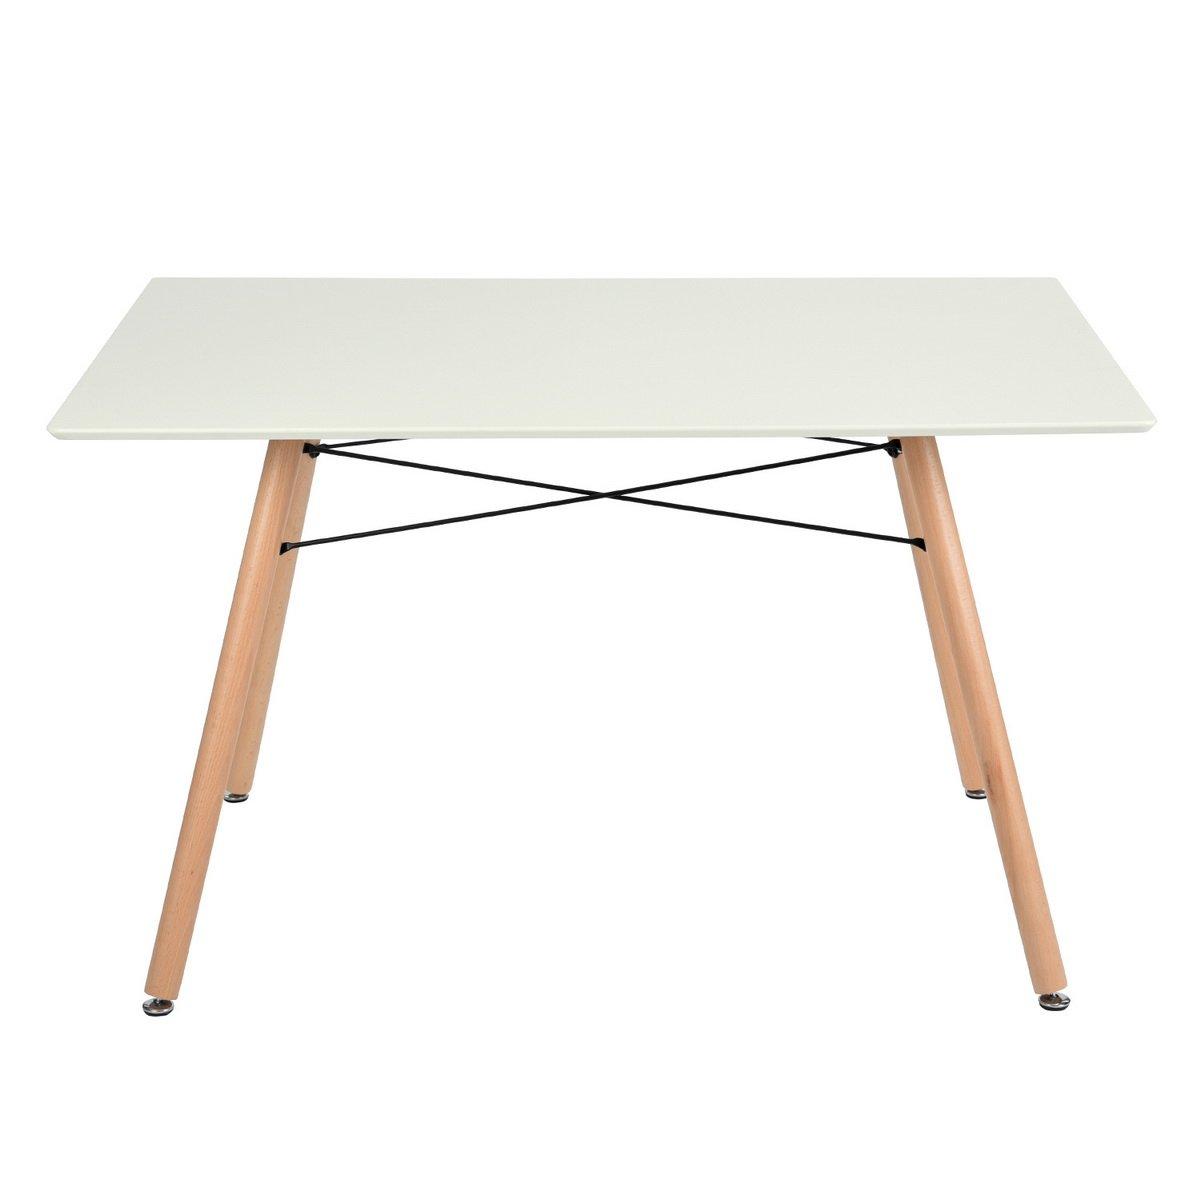 tavolo da pranzo moderno in stile scandinavo r/étro N.B Furniture